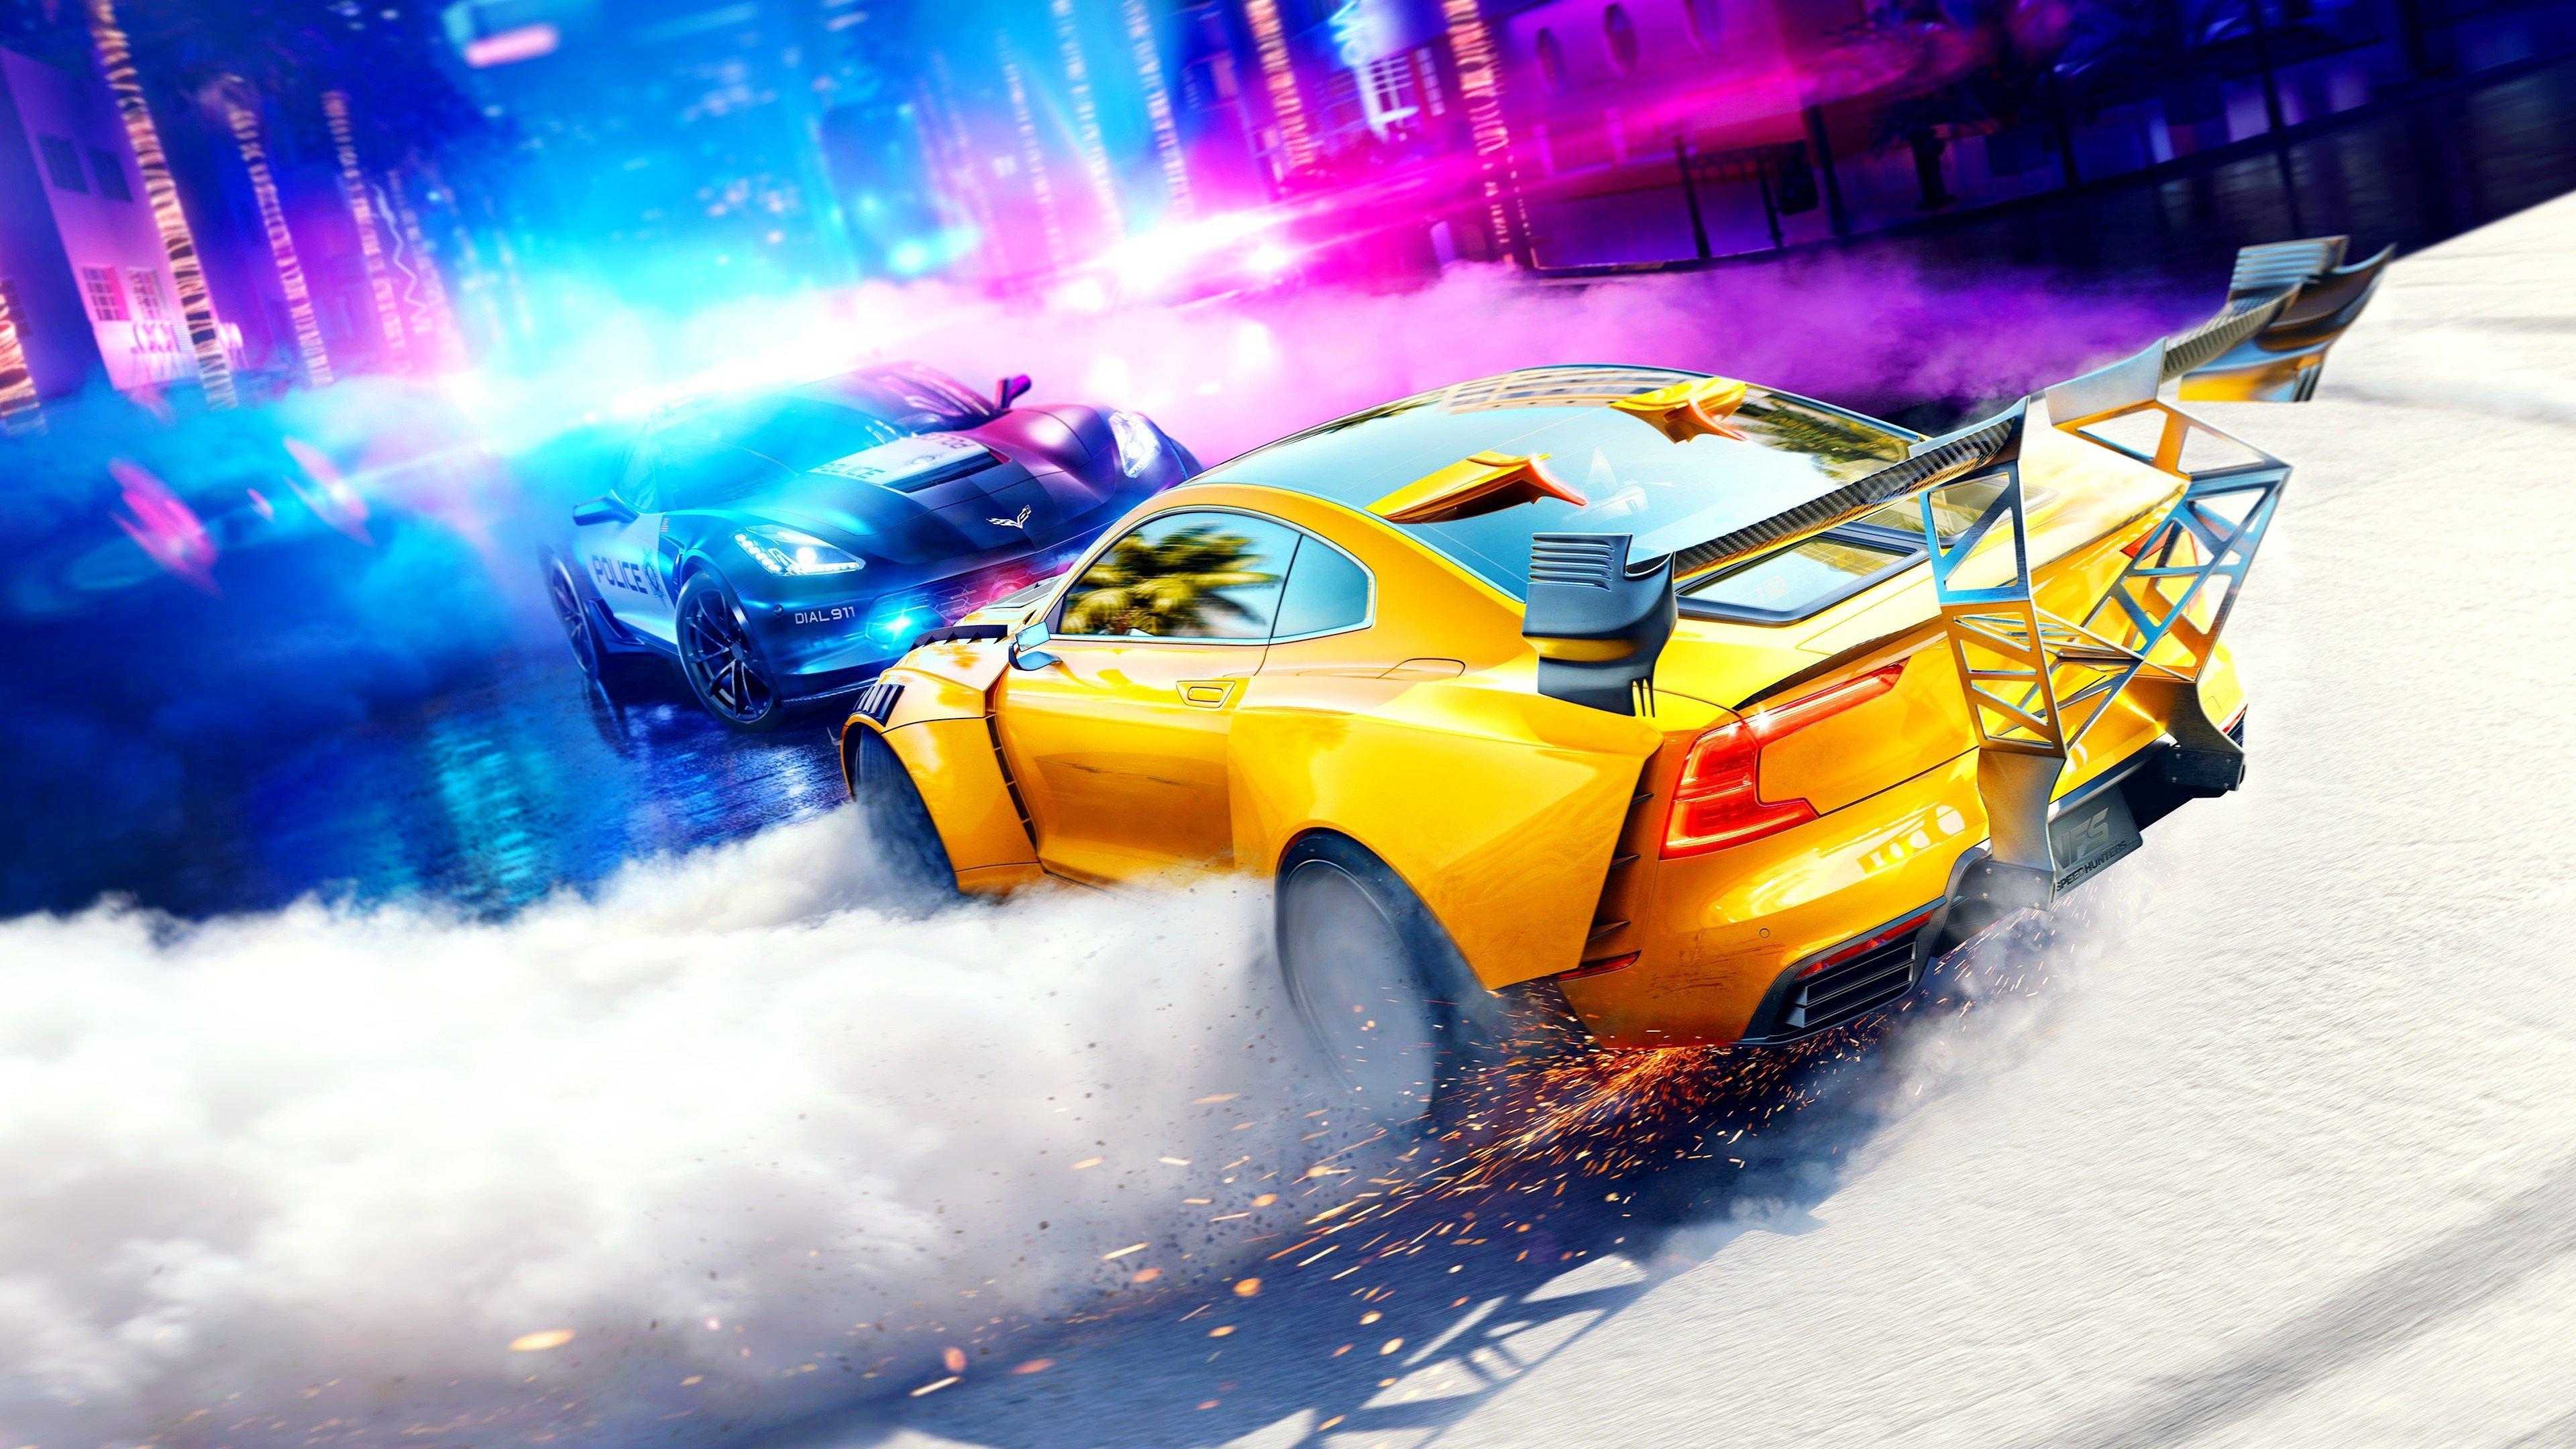 Fondos de pantalla Juego Need for Speed Heat